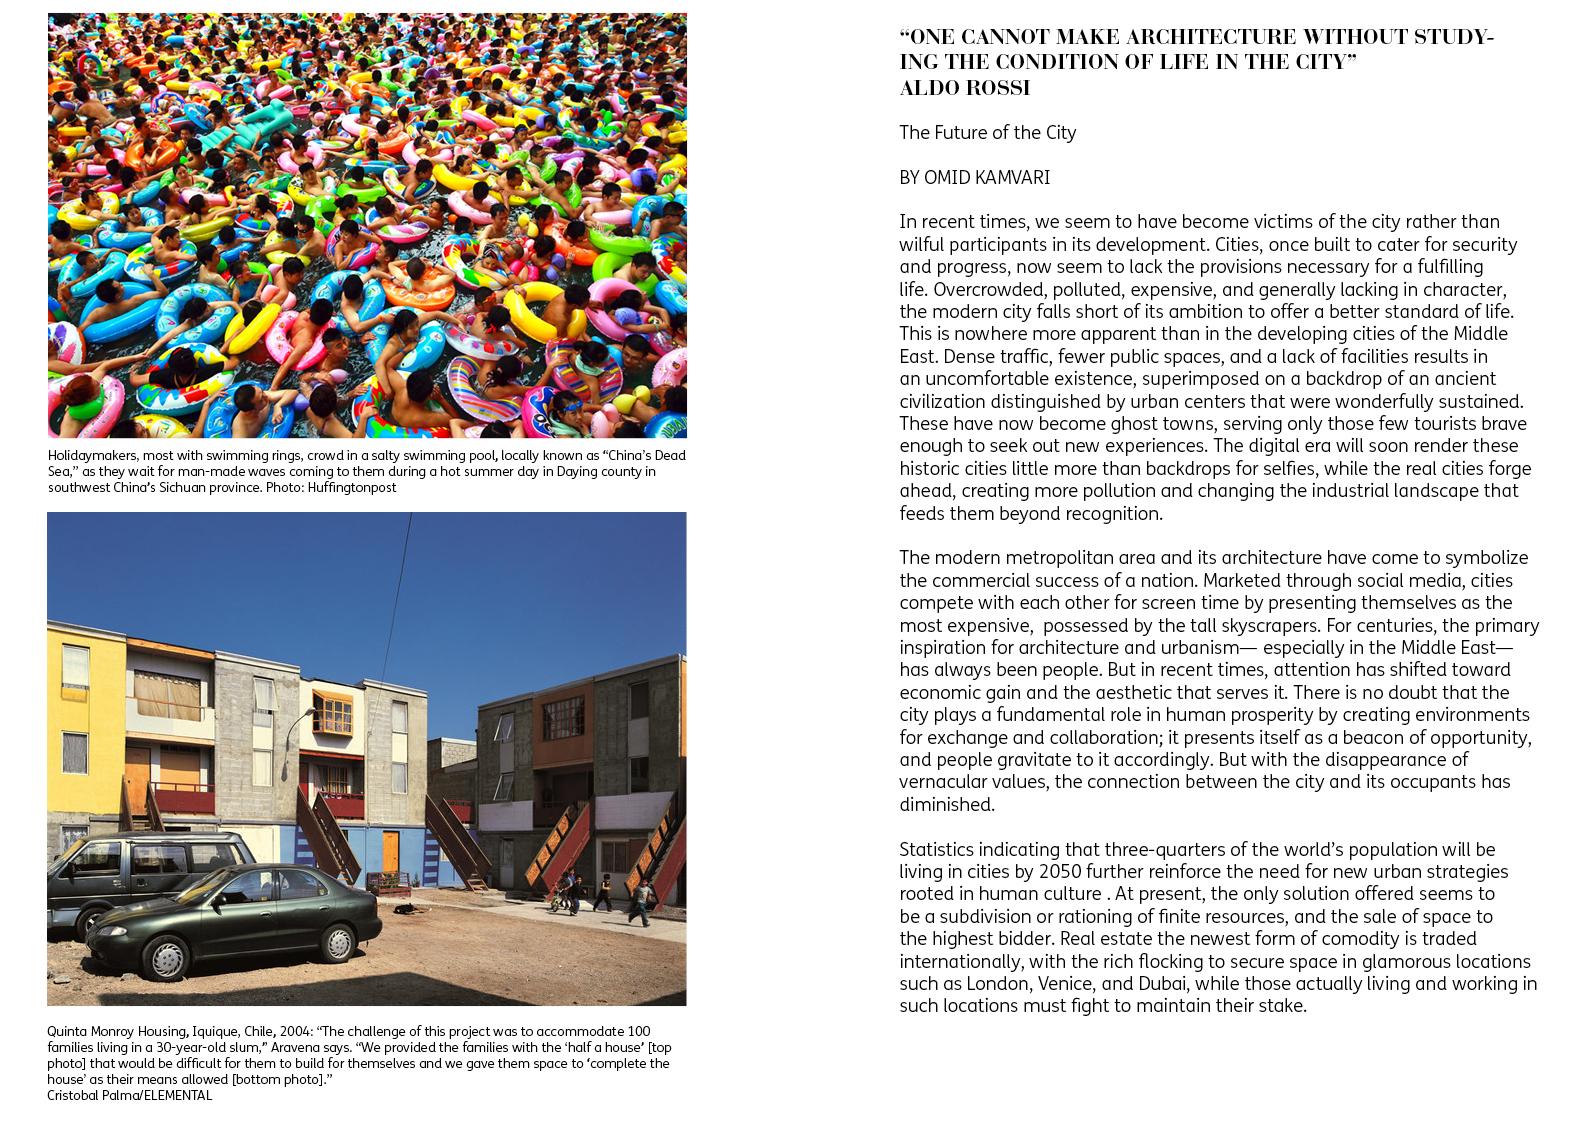 160110- Omid Kamvari-Guggenheim Article-1